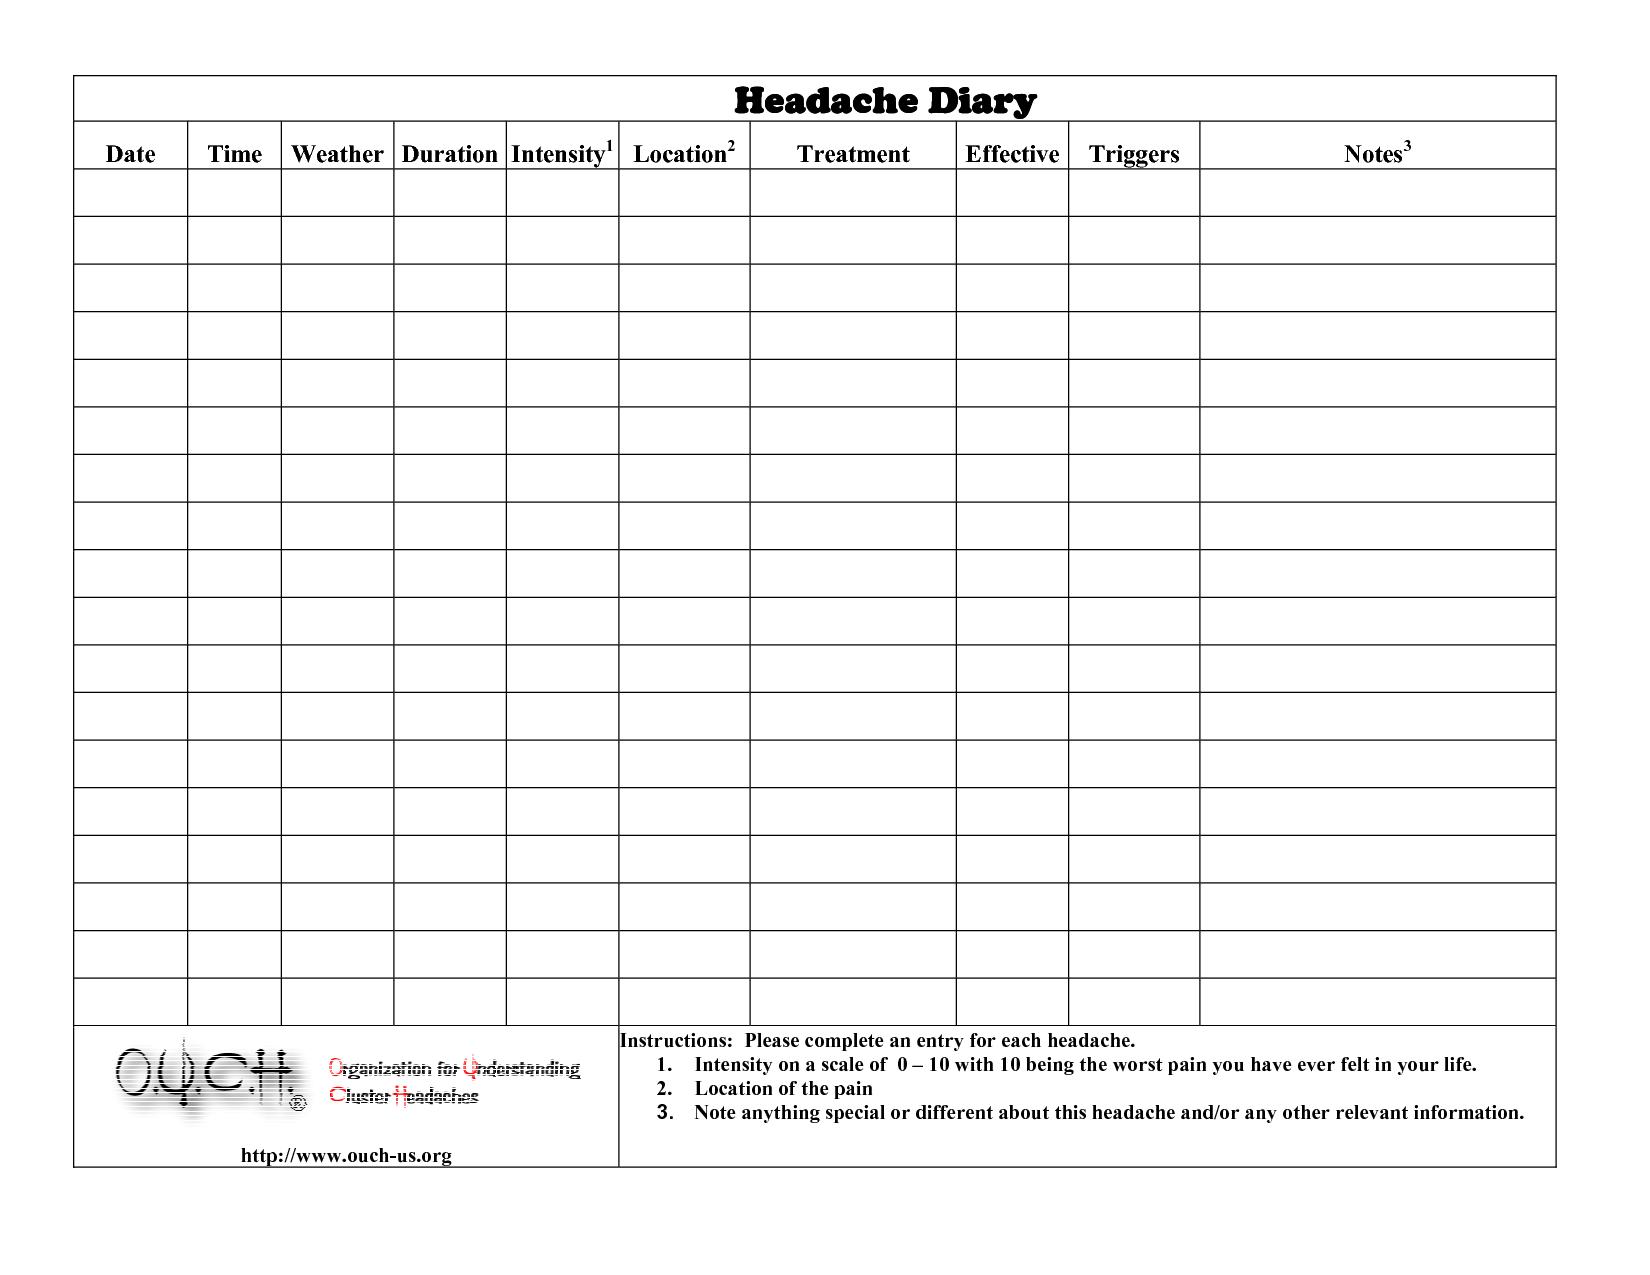 Headache Diary Headache Diary | Health | Headache Diary, Printables - Free Printable Headache Diary